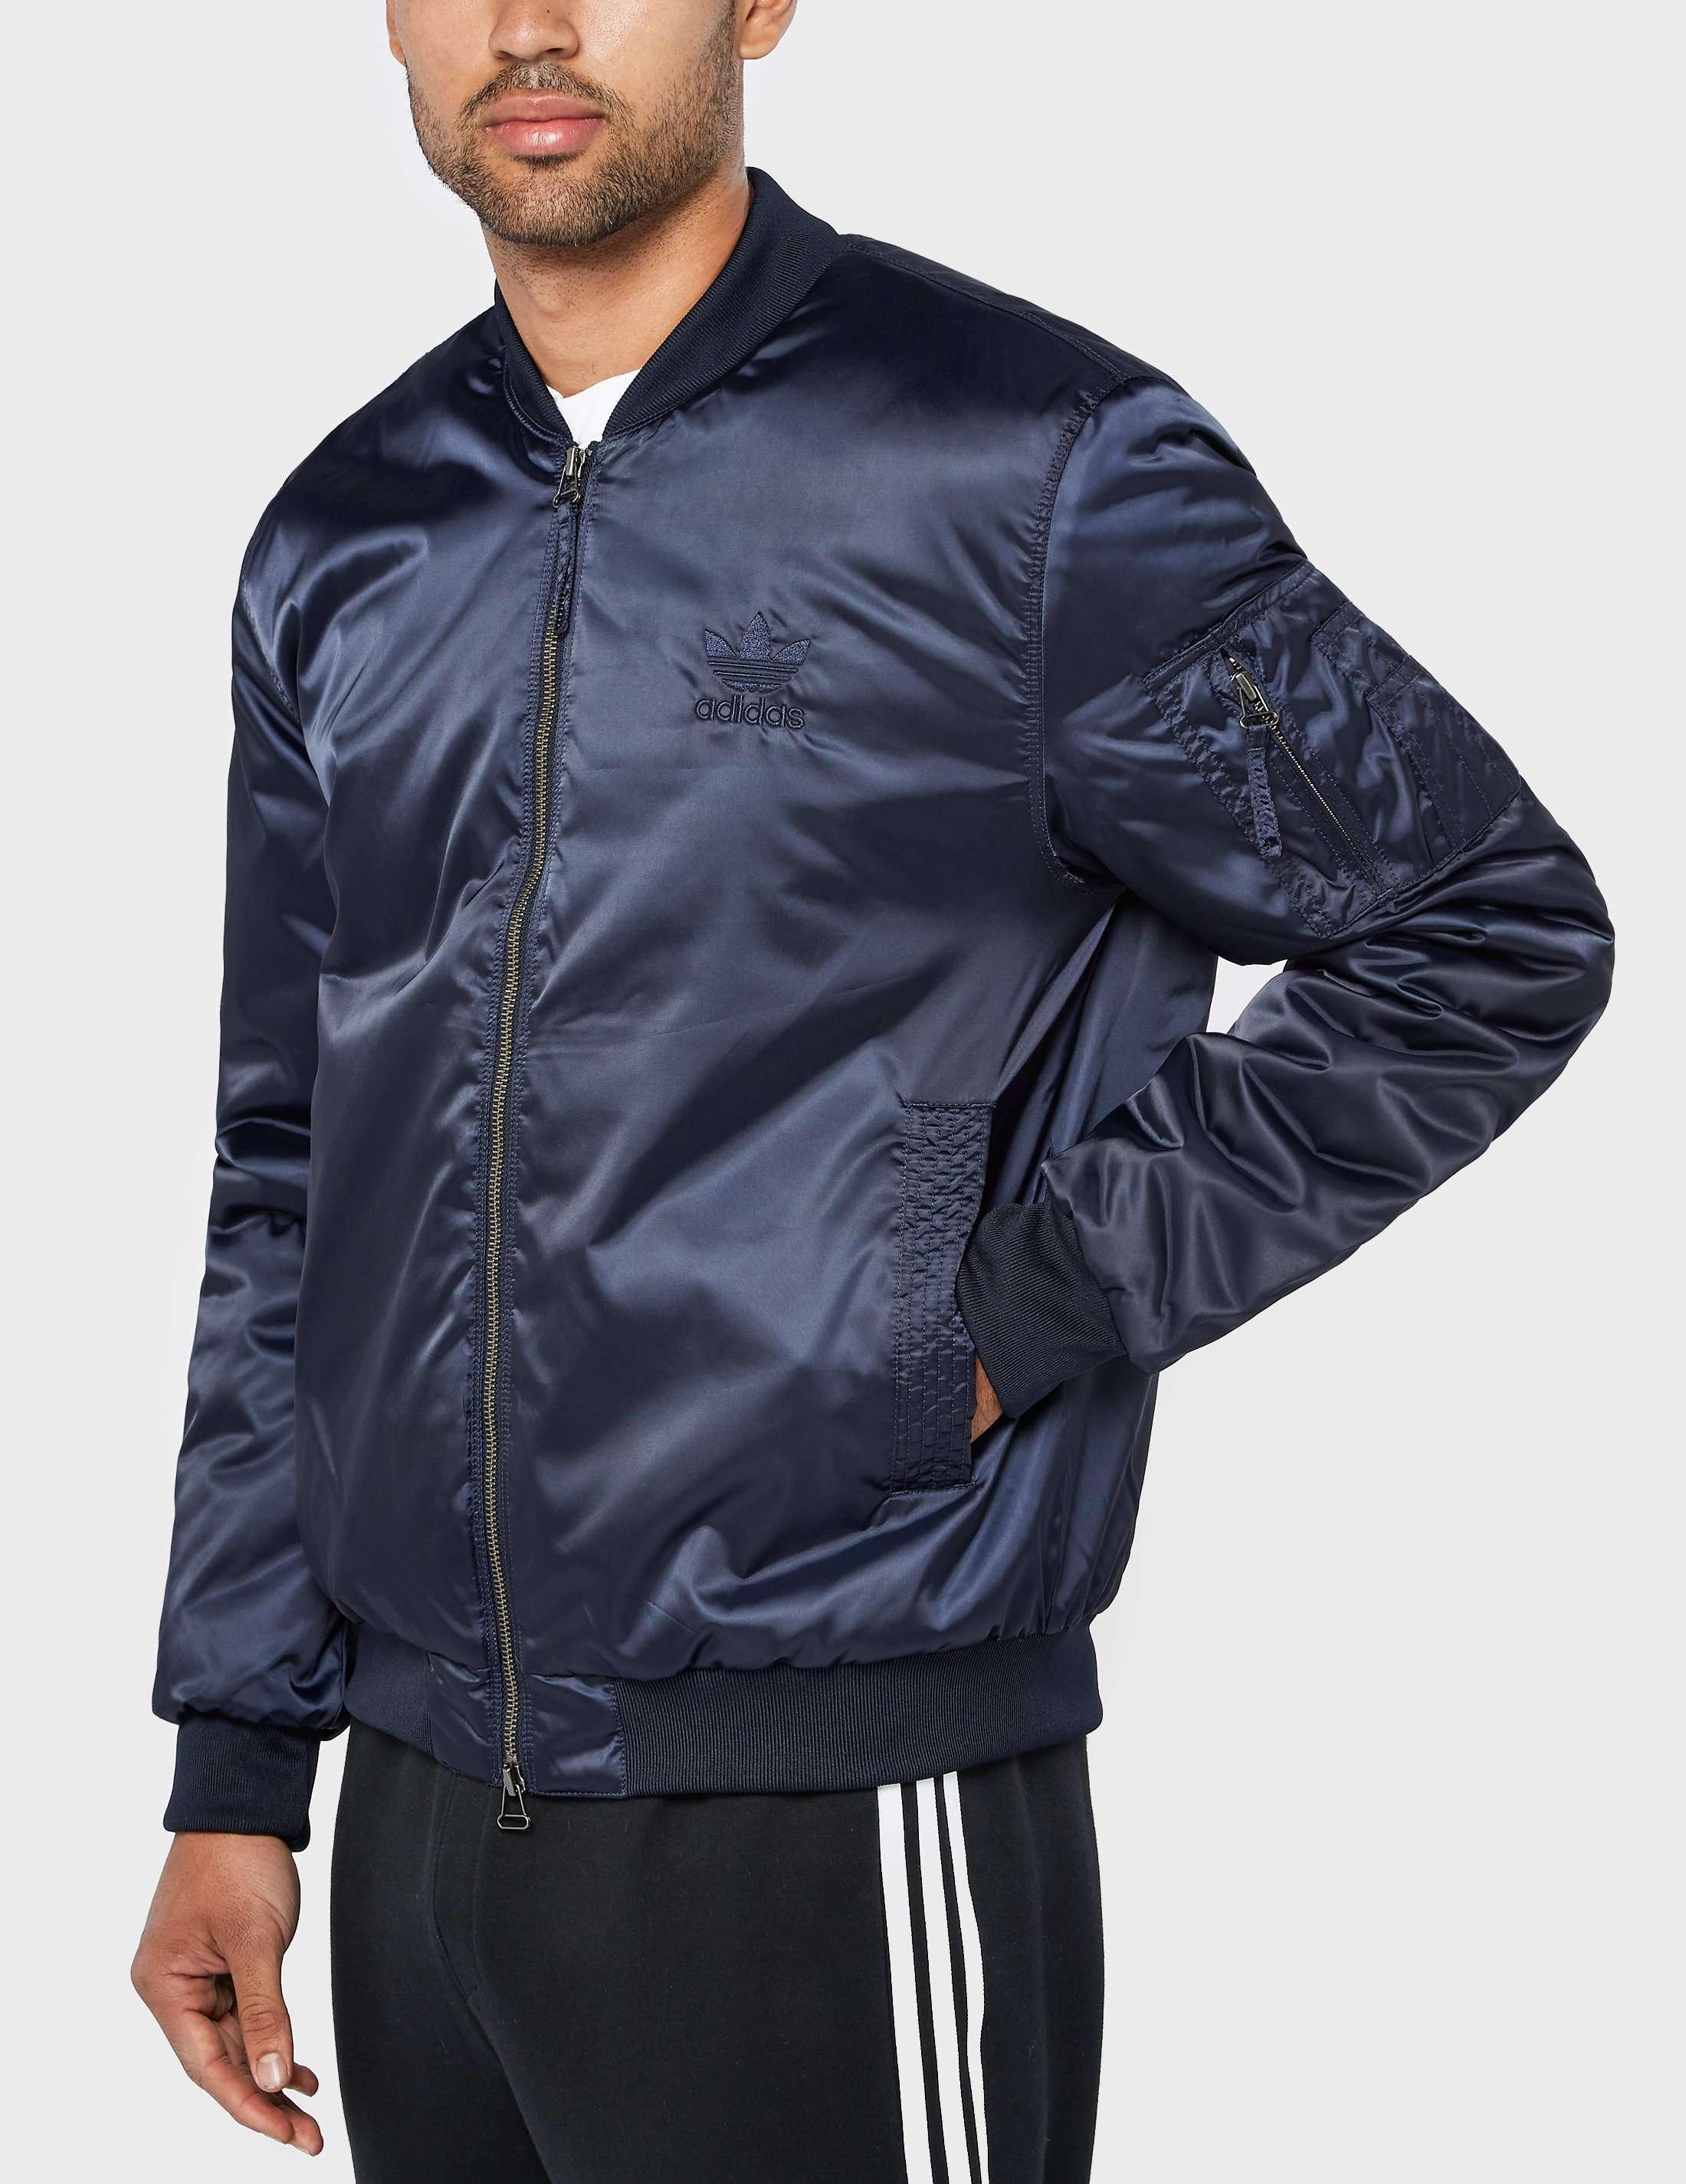 adidas Originals MA1 Superstar Bomber Jacket | scotts Menswear